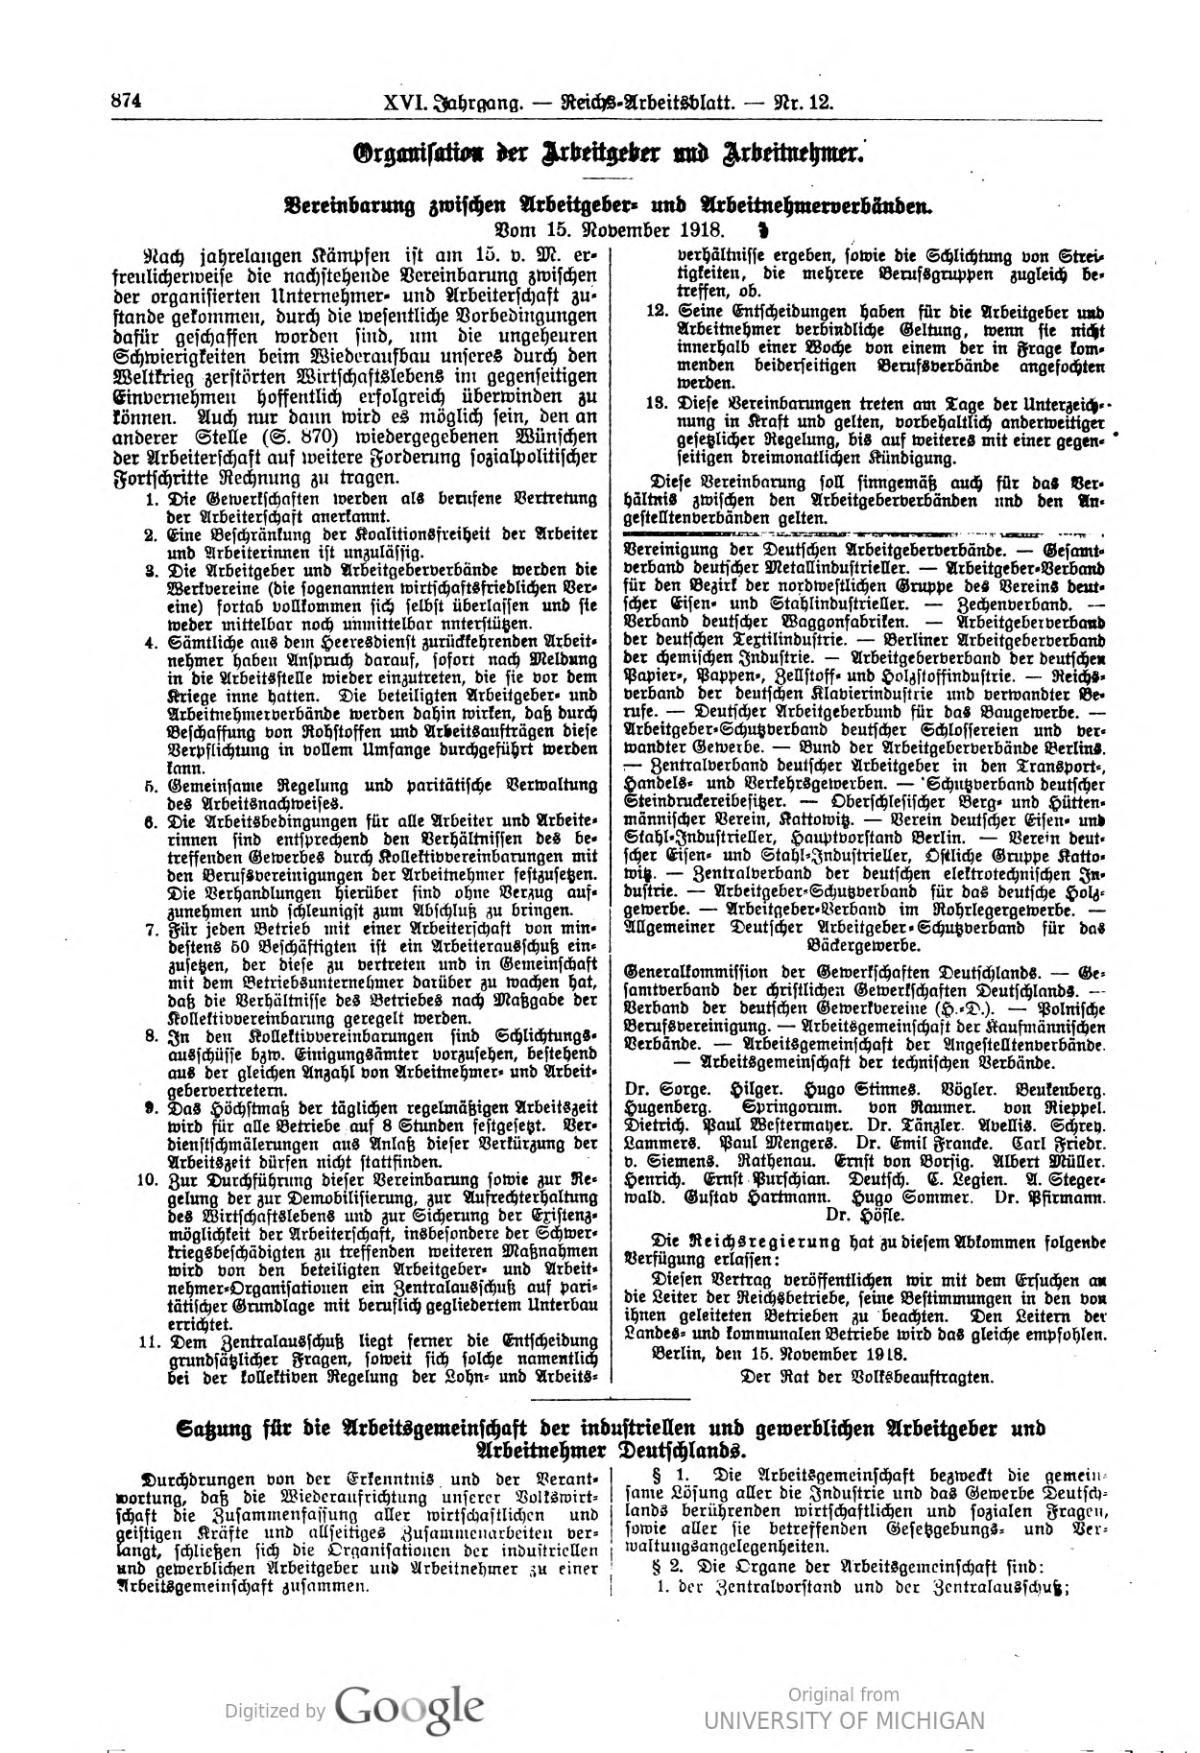 Stinnes-Legien-Abkommen – Wikipedia